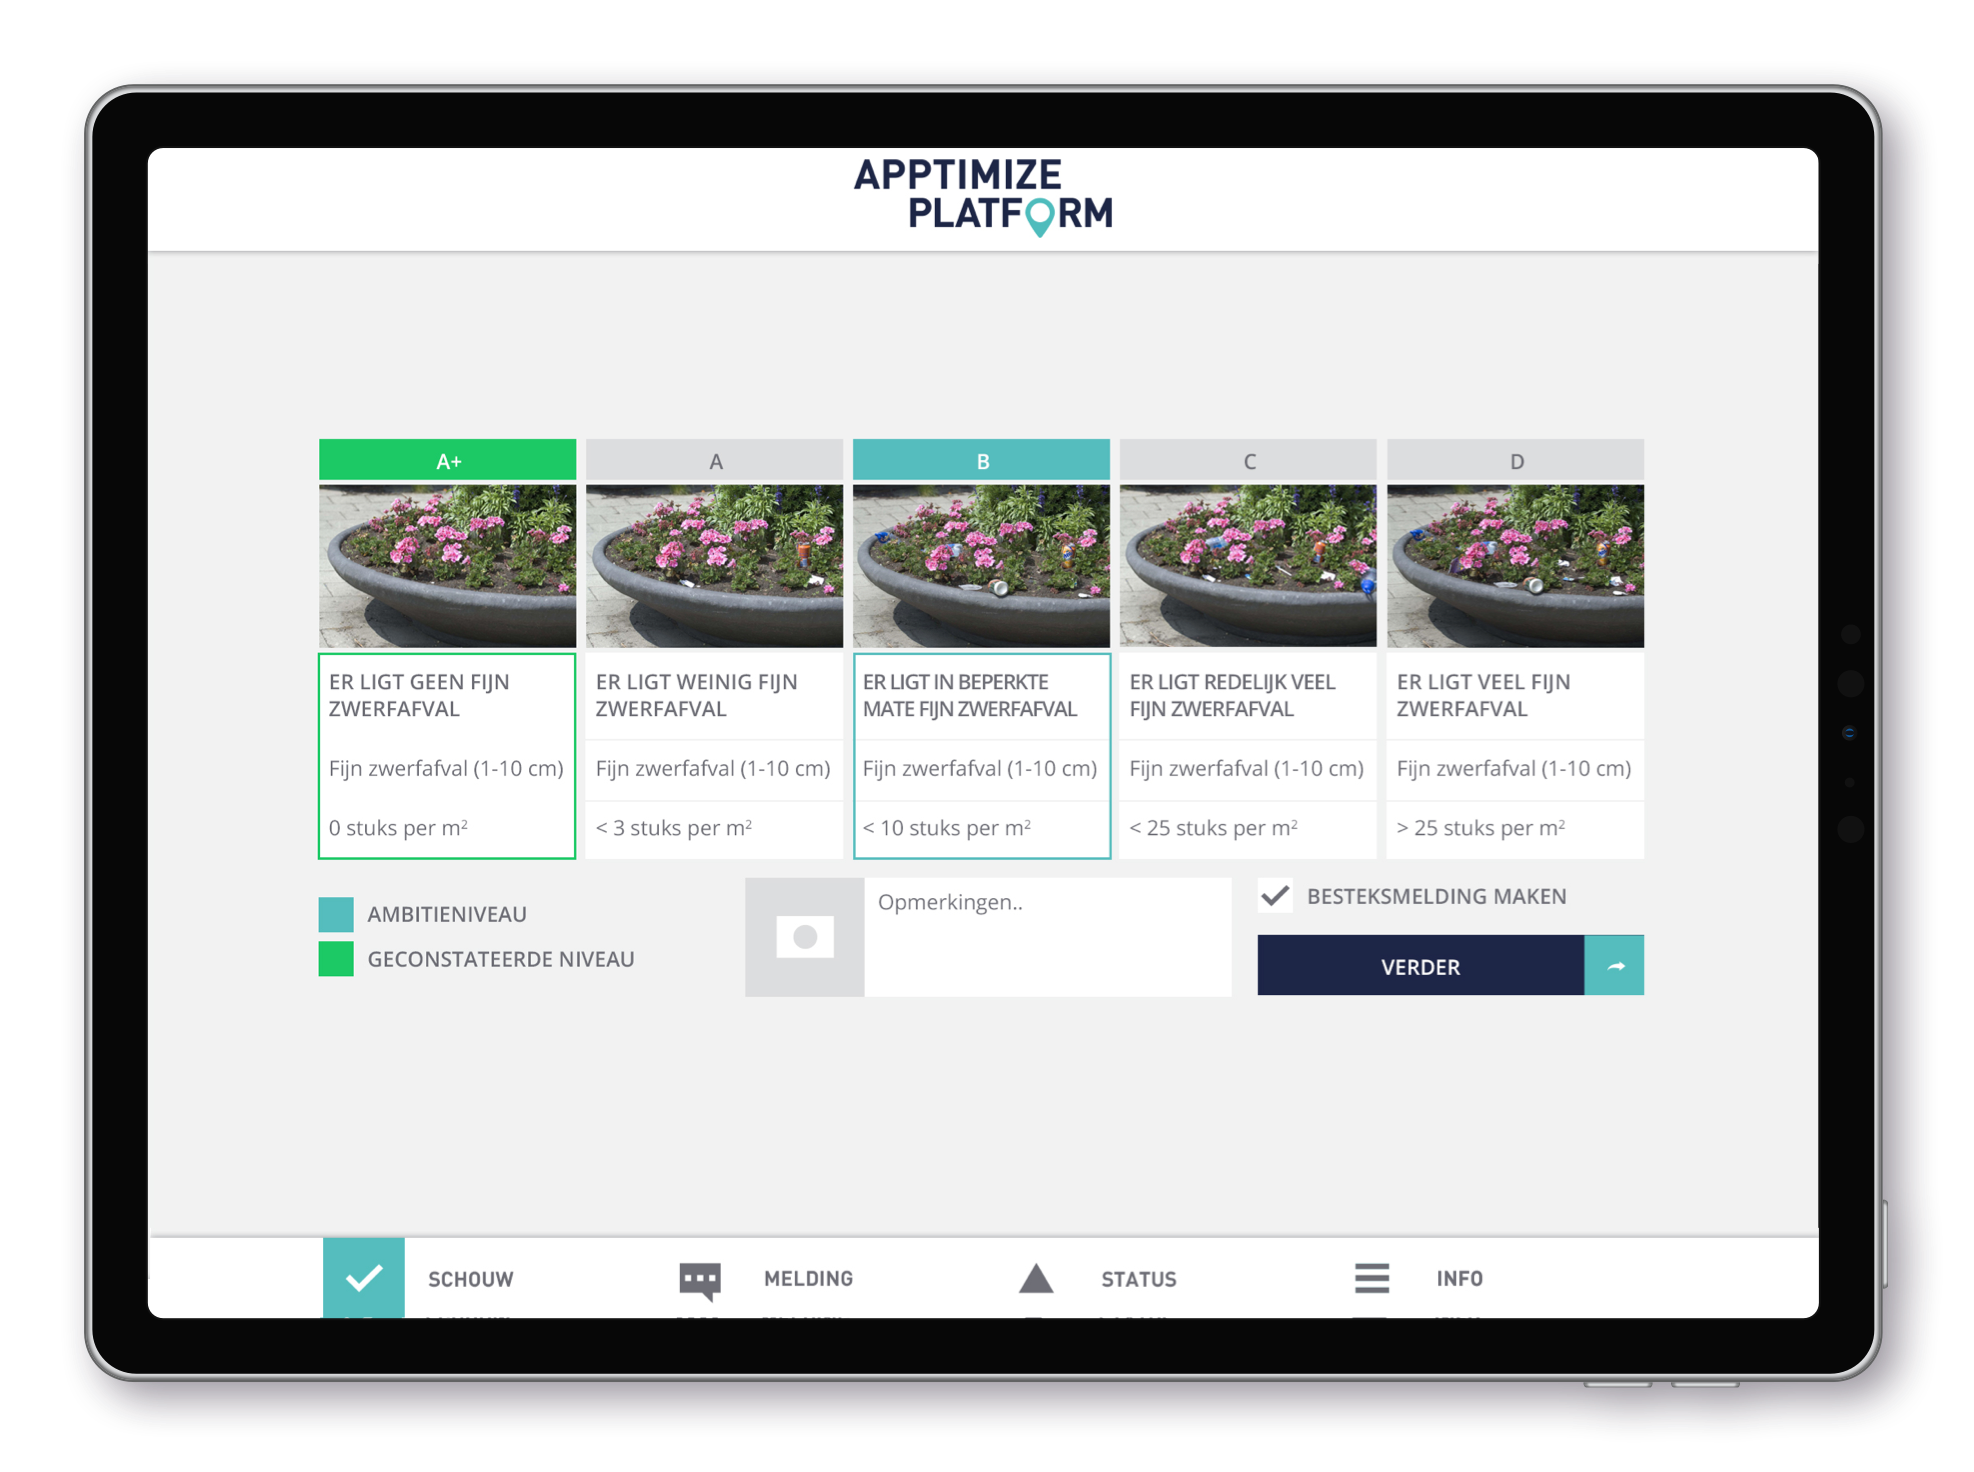 Apptimize Platform